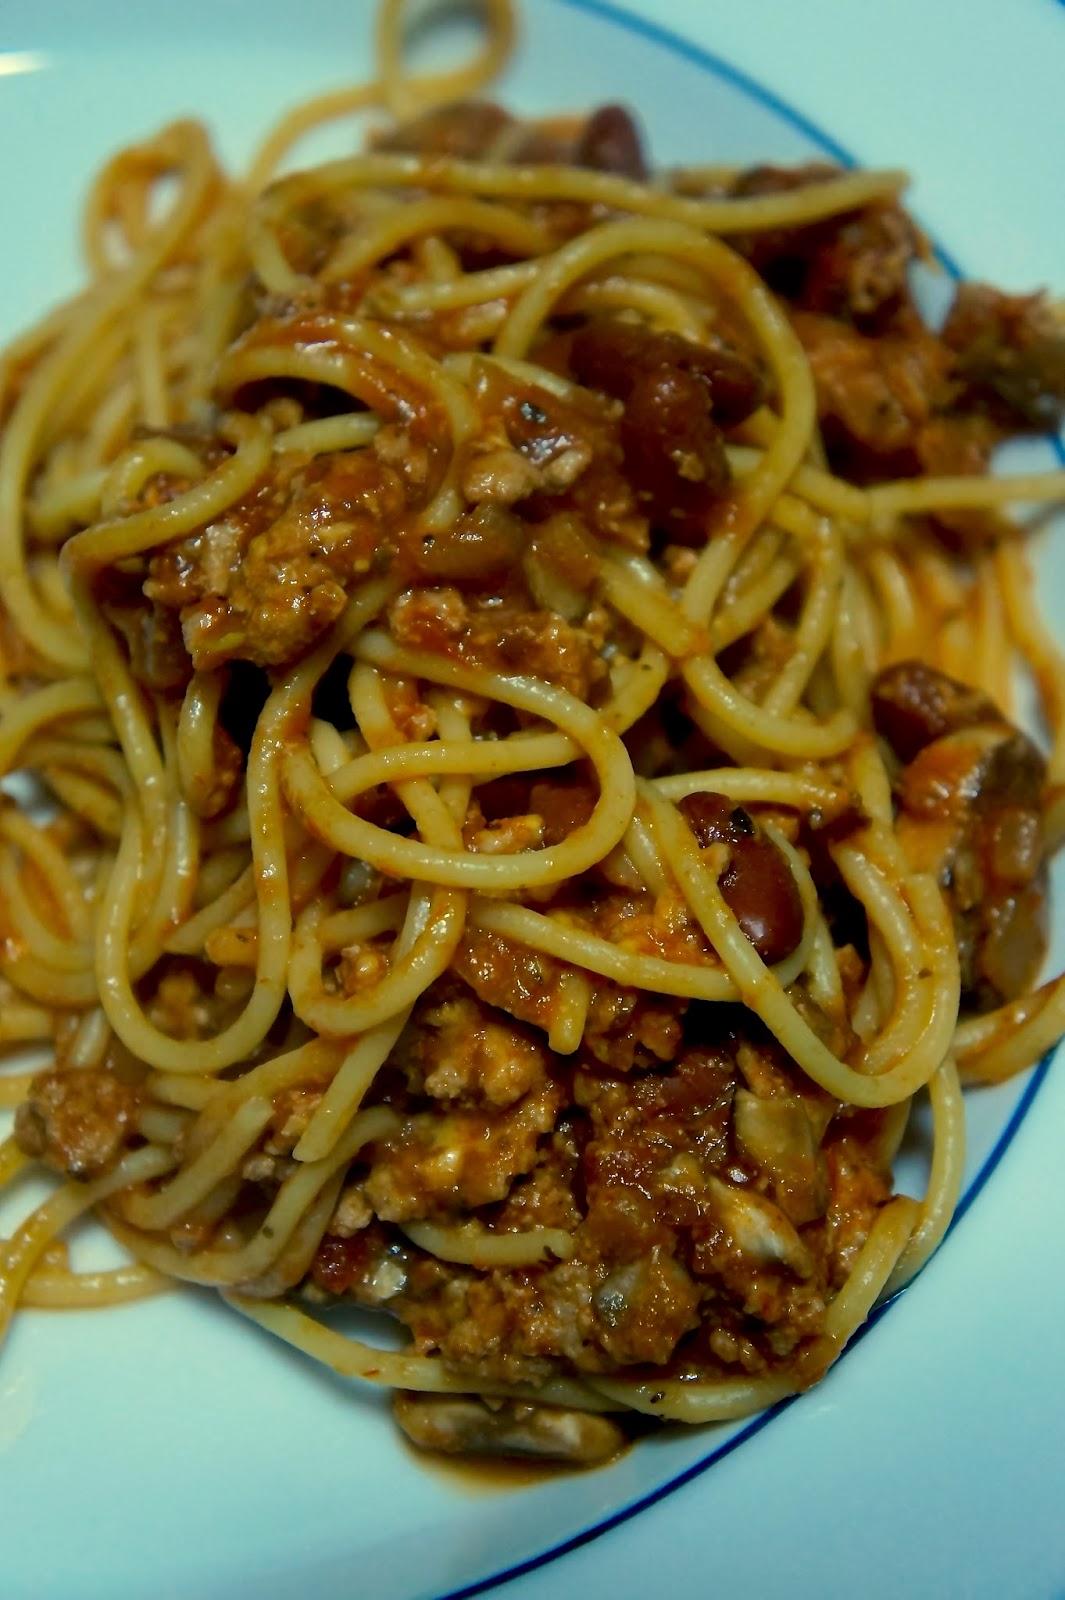 Savory Sweet and Satisfying: Cincinnati Chili with Pasta